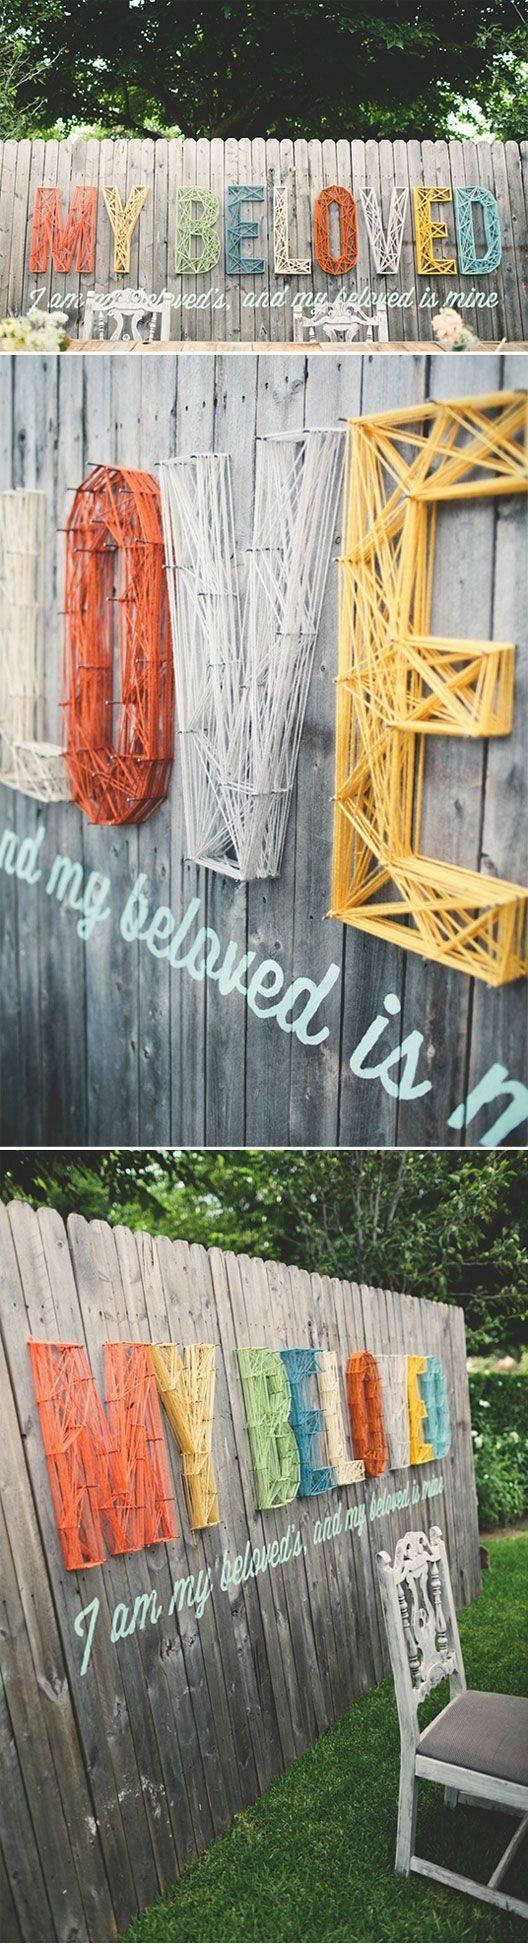 Incredible Diy Garden Fence Wall Art Ideas In Latest 3d Garden Wall Art (View 16 of 20)